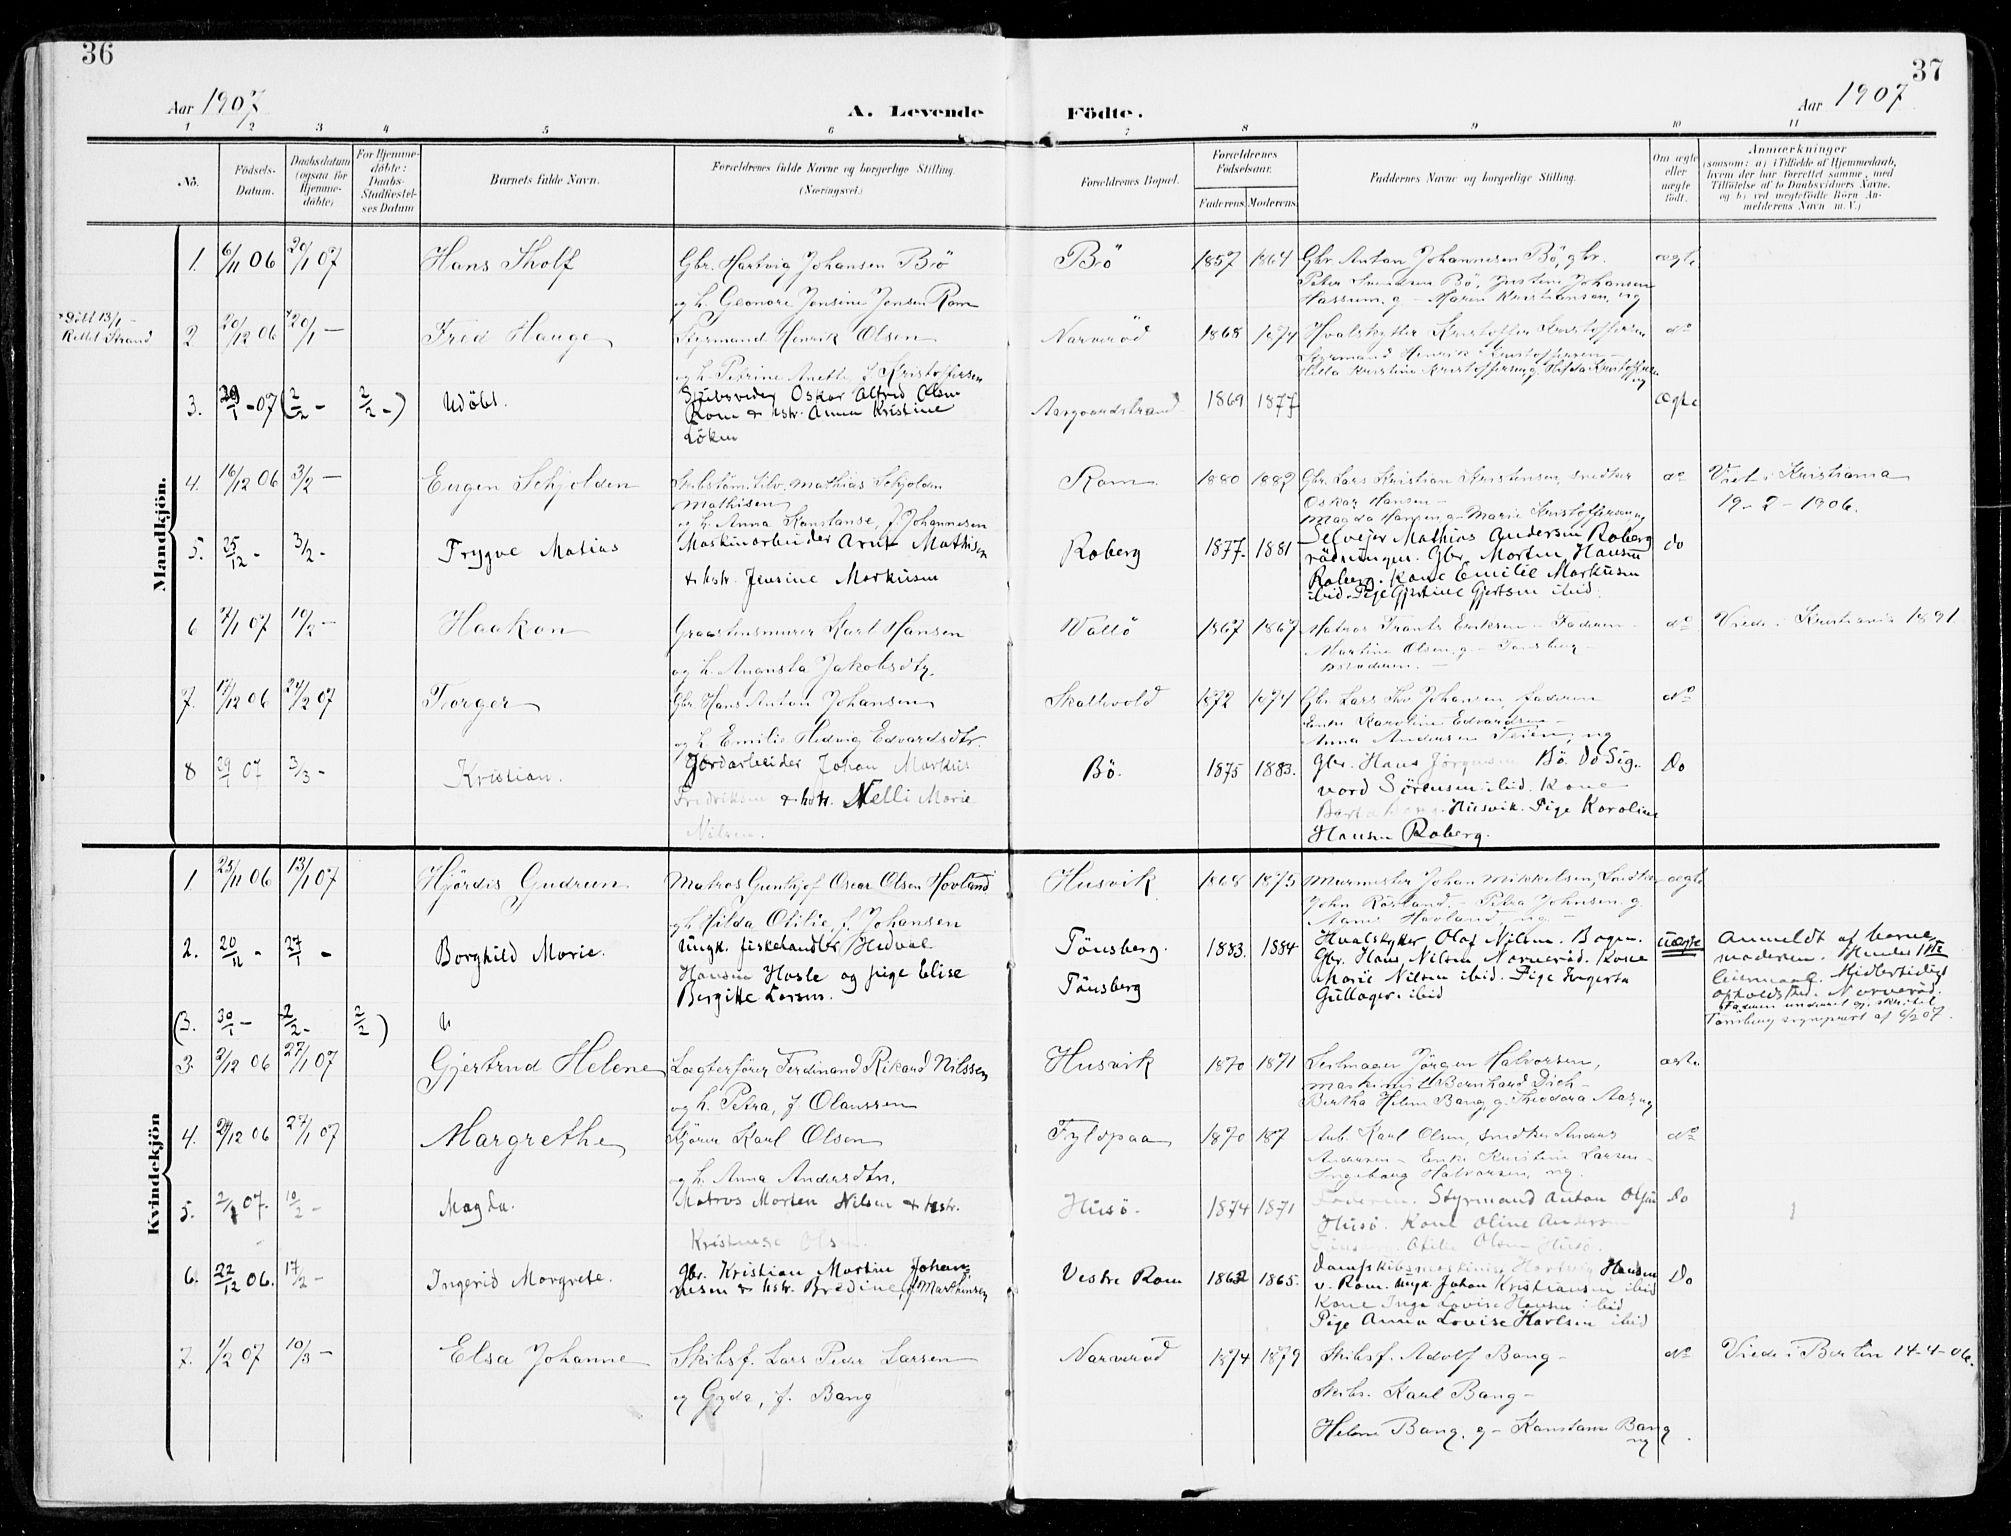 SAKO, Sem kirkebøker, F/Fb/L0006: Ministerialbok nr. II 6, 1905-1918, s. 36-37